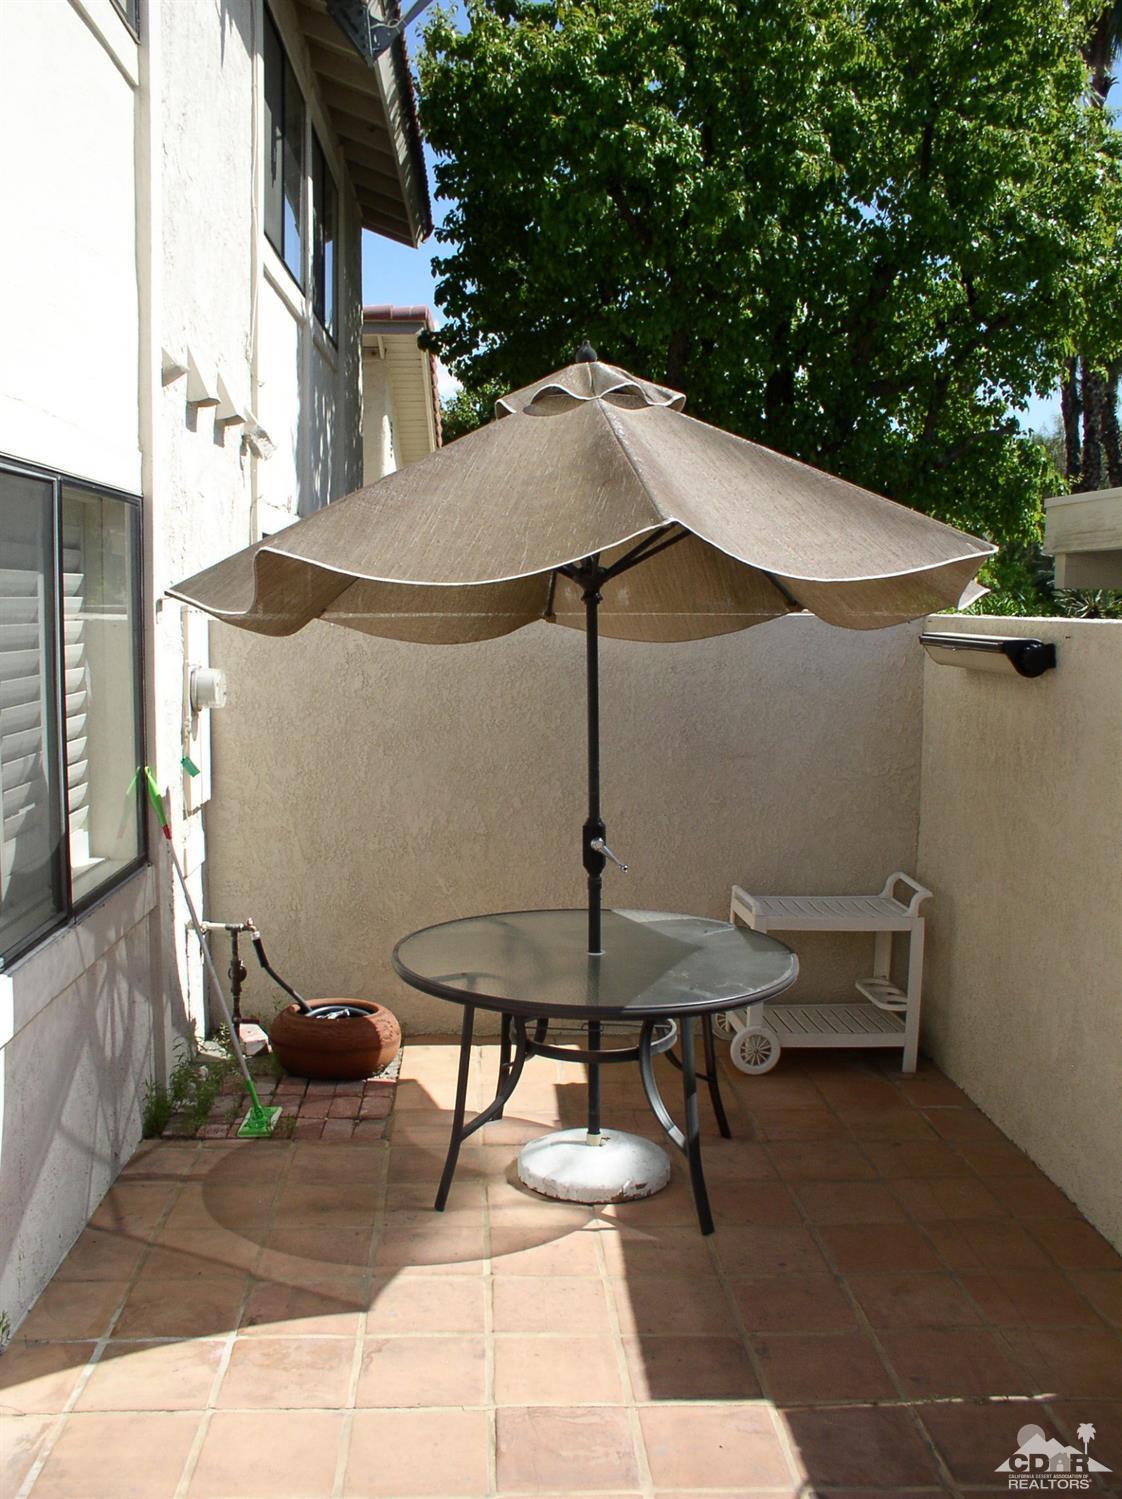 6105 Montecito Drive E, Palm Springs, California 92264, 4 Bedrooms Bedrooms, ,3 BathroomsBathrooms,Residential,Sold,6105 Montecito Drive E,219016149